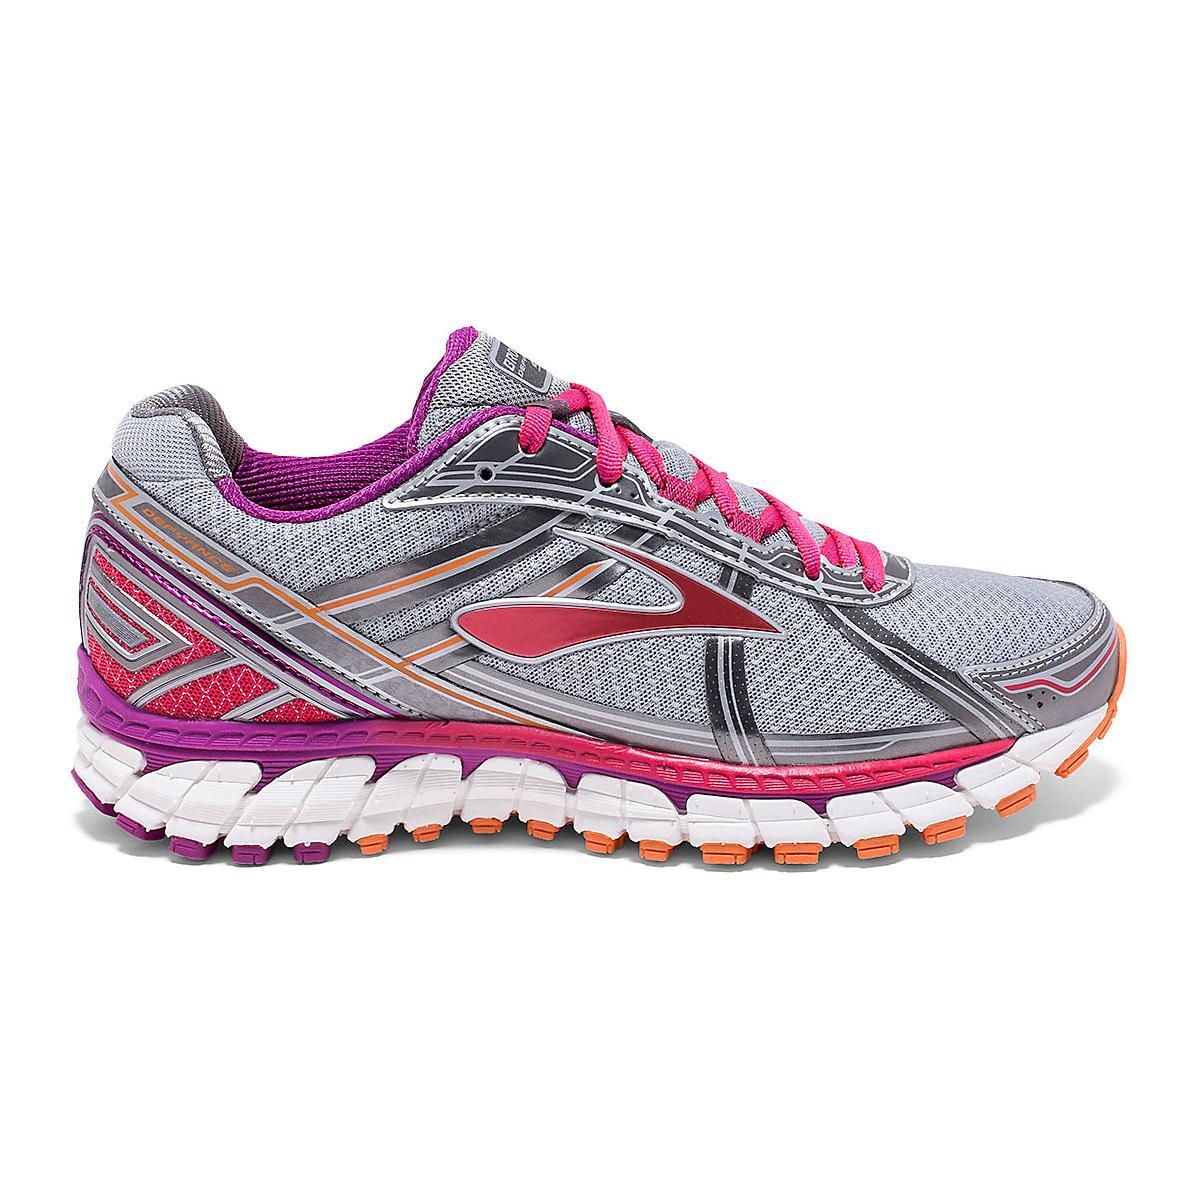 cd4430a8d2c66 Womens Brooks Defyance 9 Running Shoe at Road Runner Sports